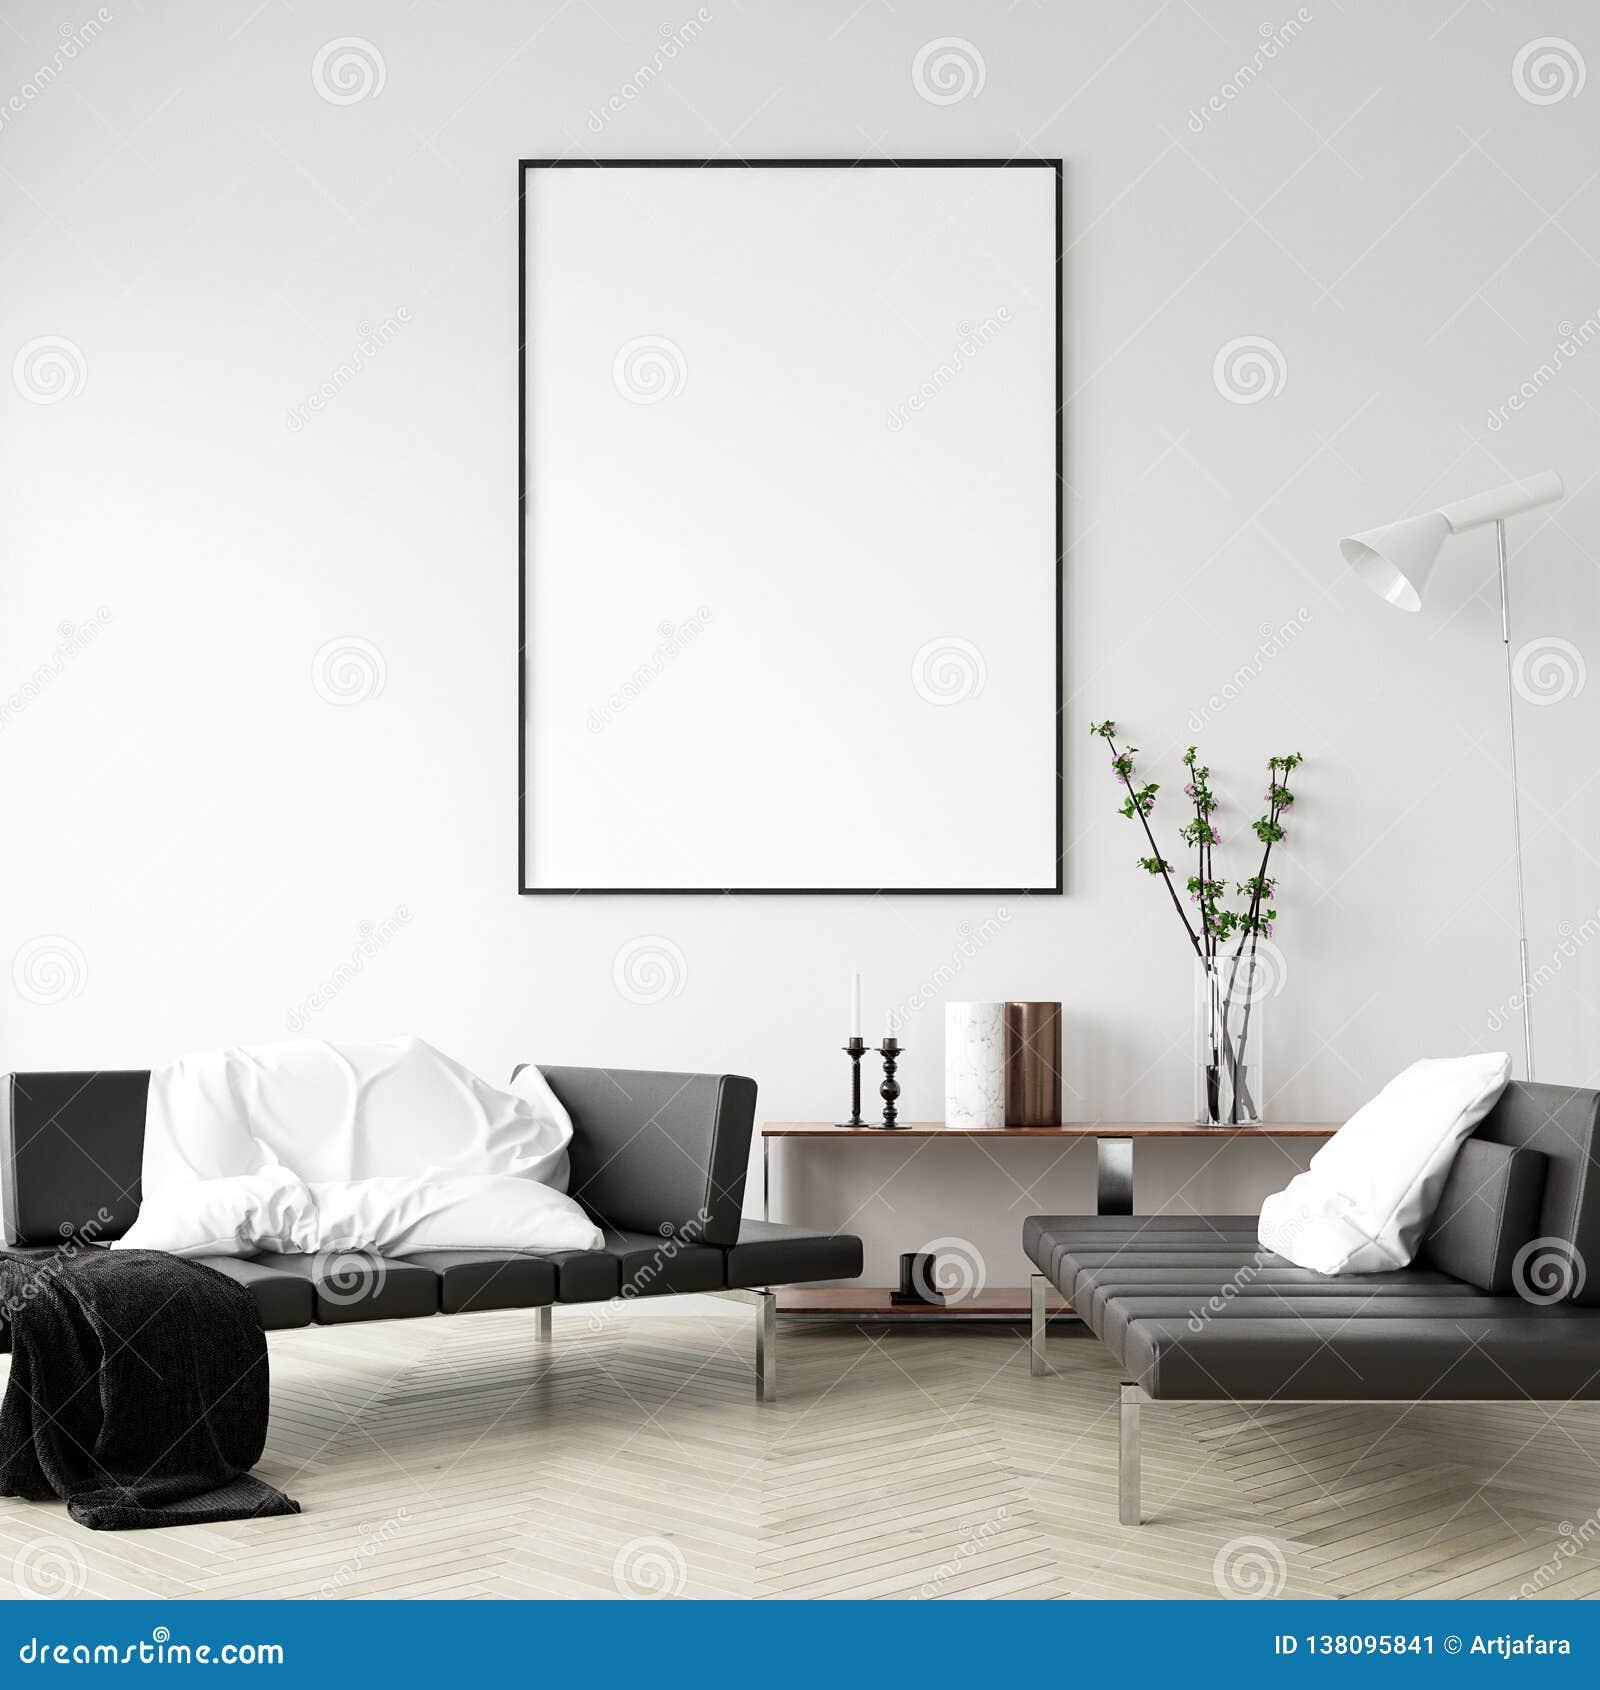 Mock Up Poster Frame In Home Interior Background Modern Style Living Room Stock Image Image Of Mock Decor 138095841